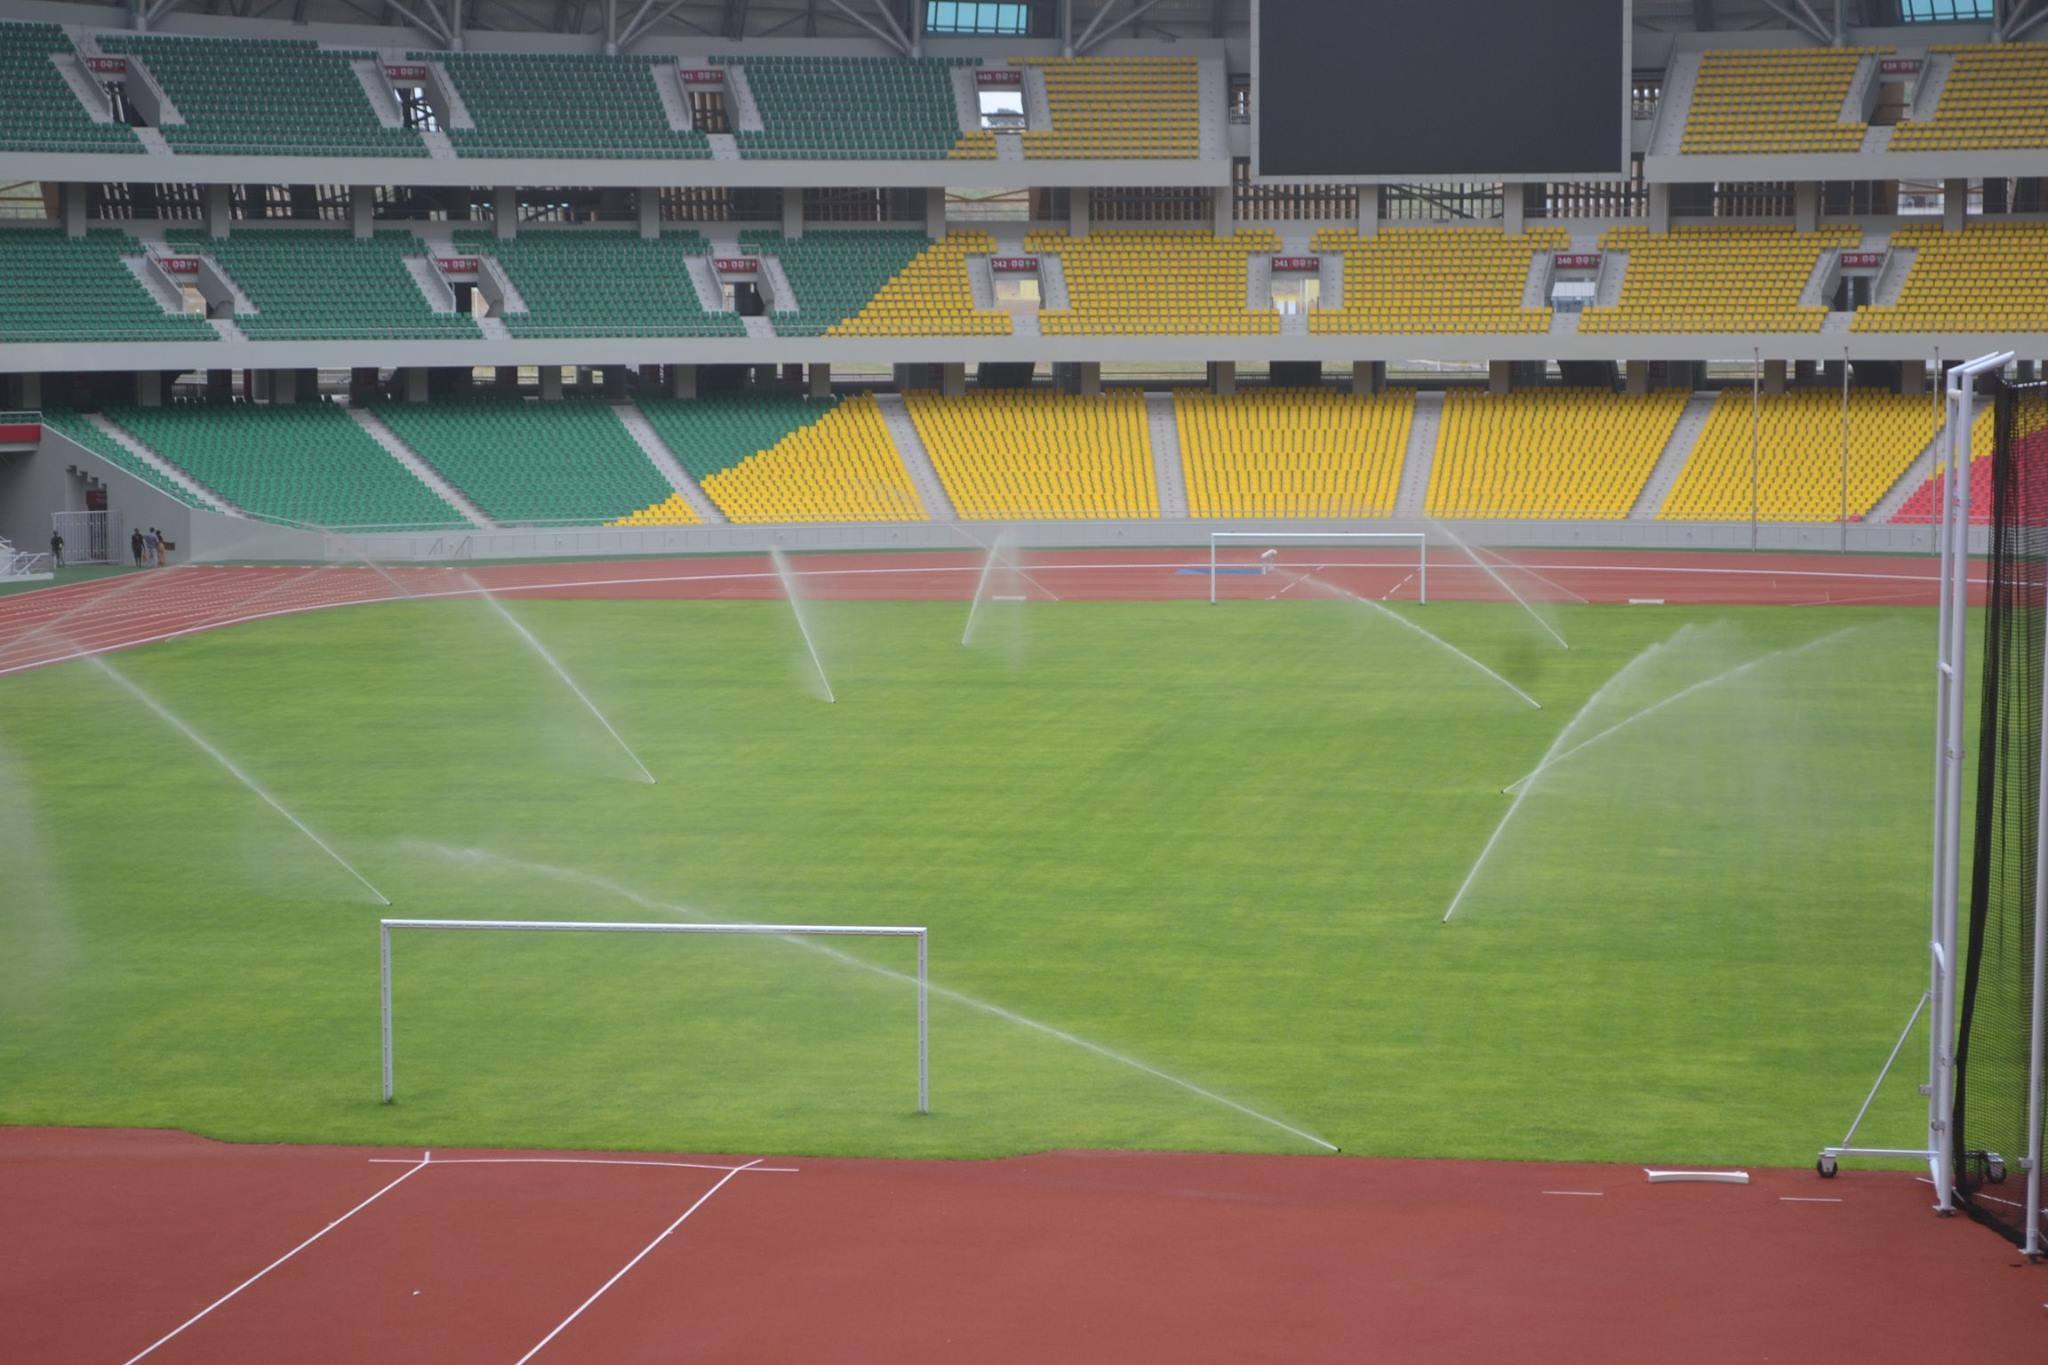 complexe sportif de Kintélé